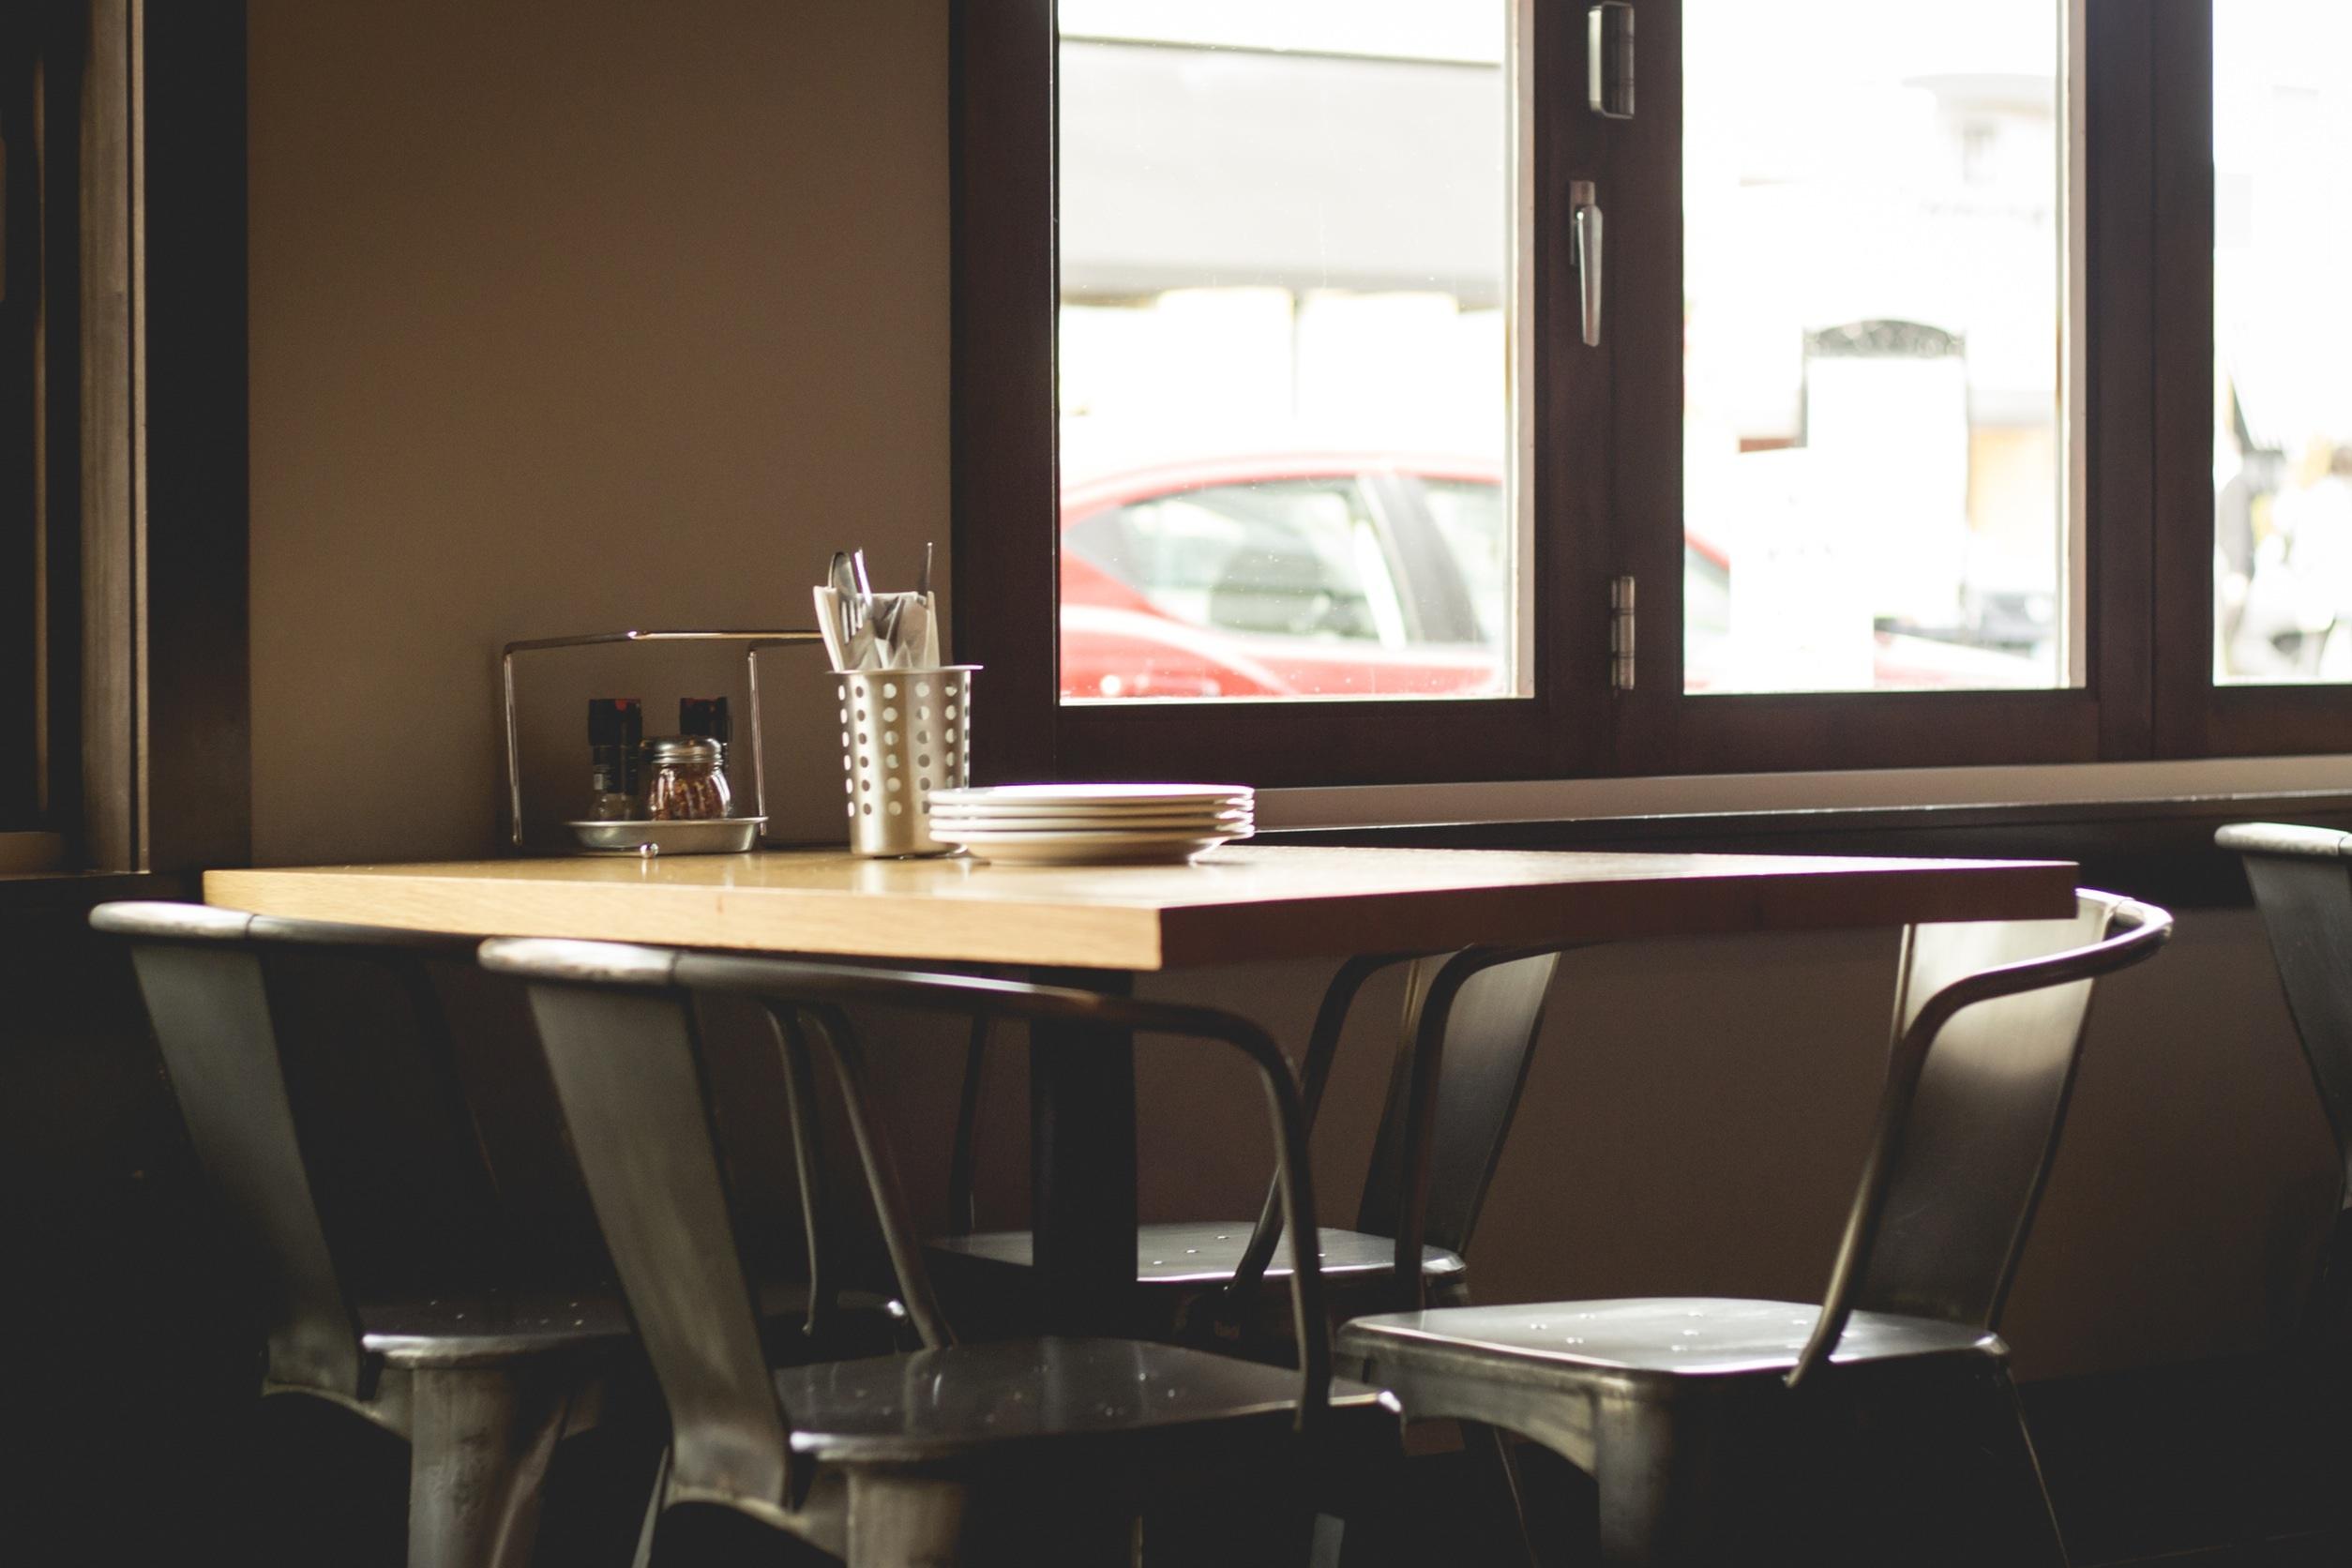 escritorio mesa cuchillera restaurante casa oficina mueble habitacin iluminacin diseo de interiores sillas diseo ventanas especias